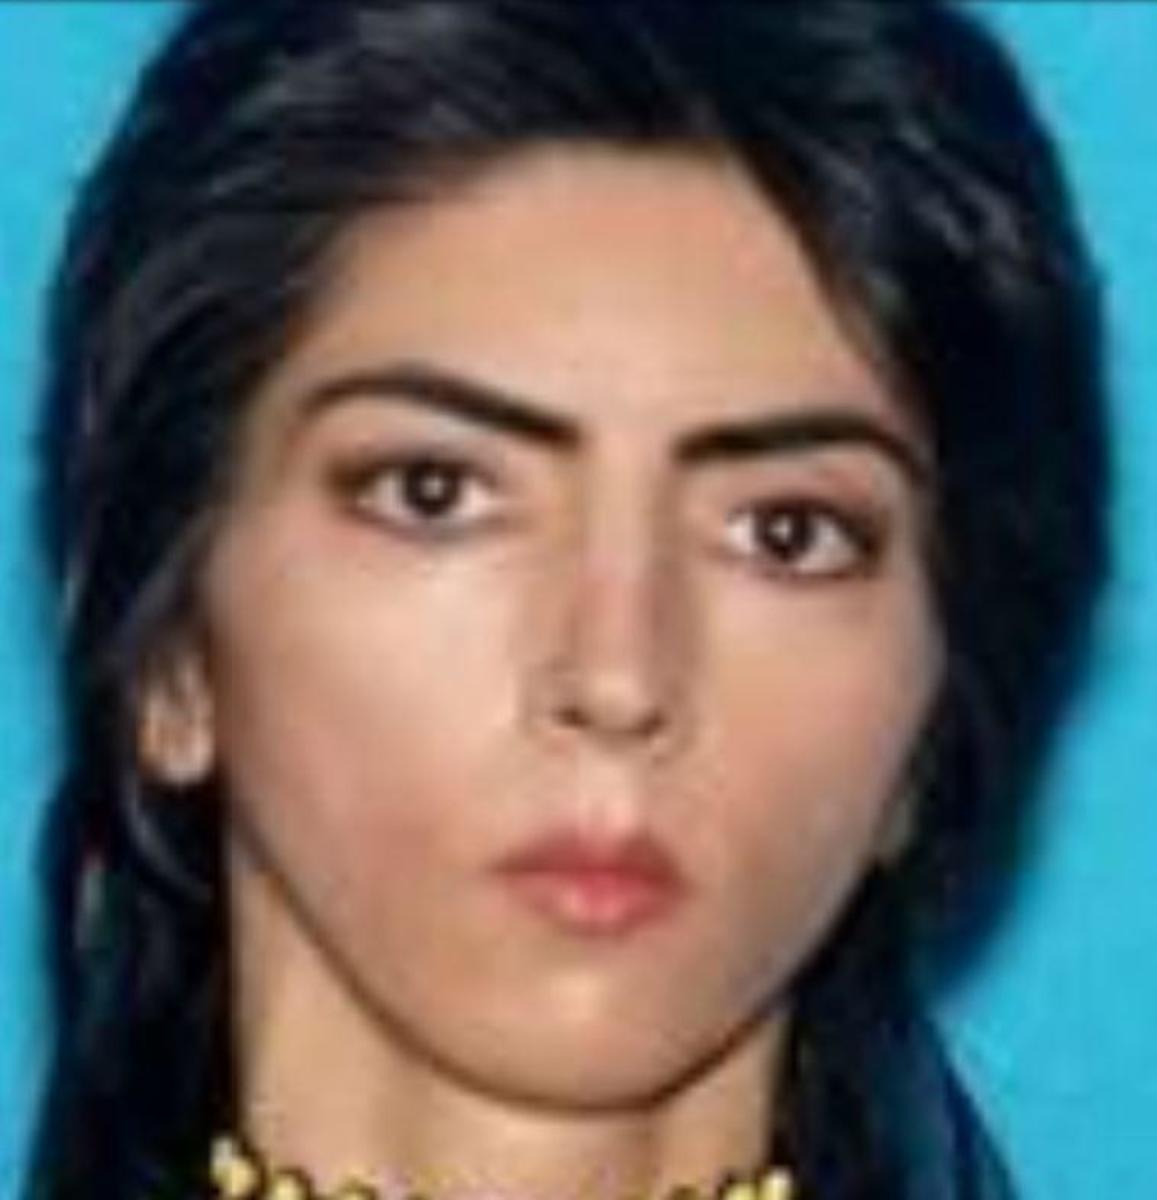 Nasim Aghdam (San Bruno Police)